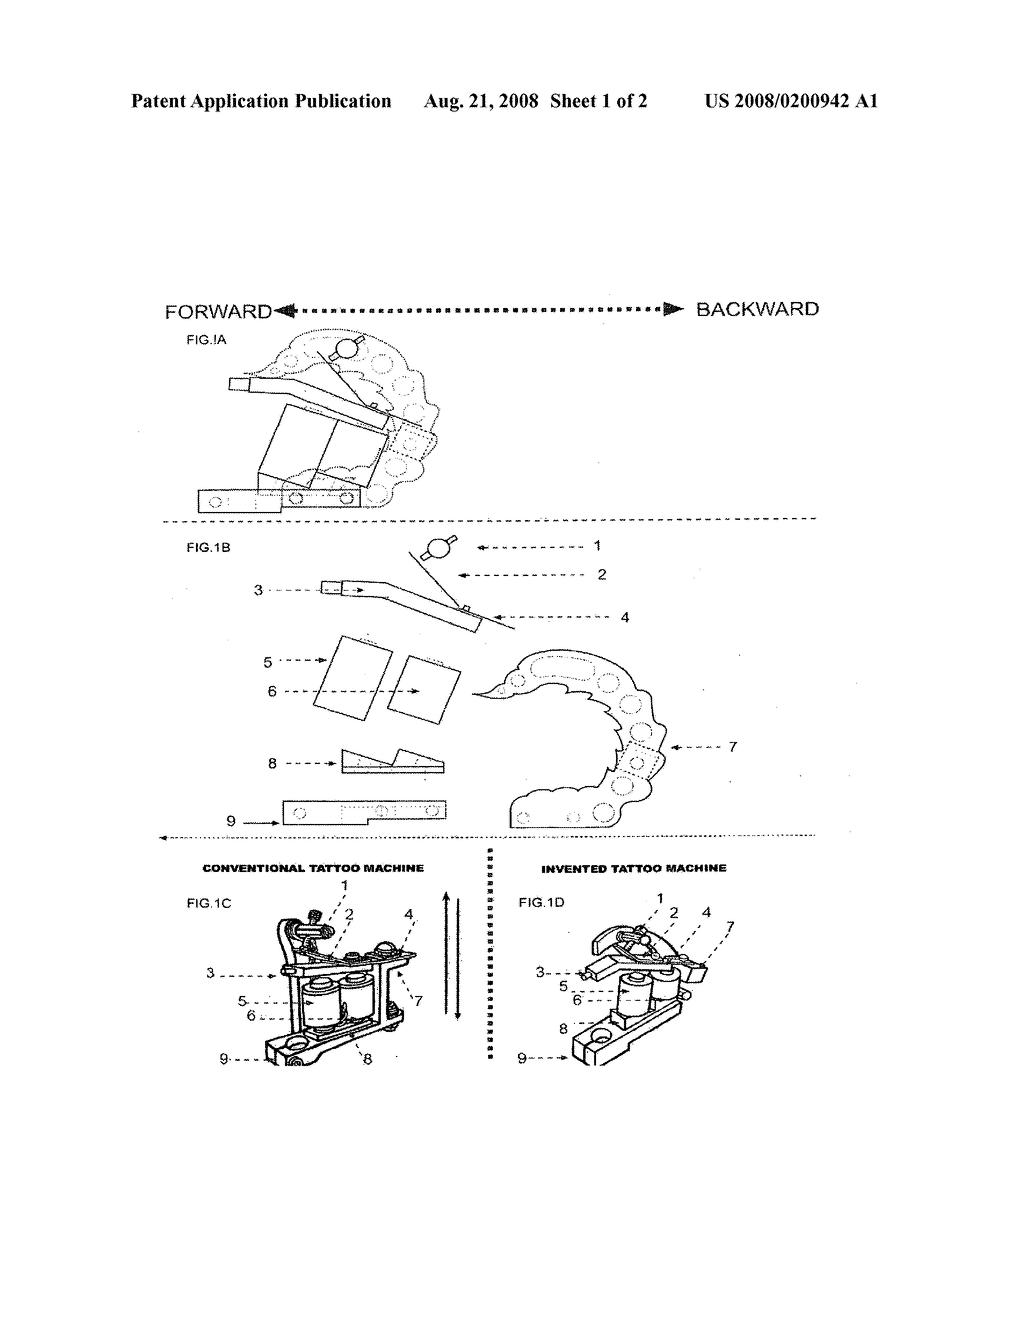 Oblique Tattoo Machine Diagram Schematic And Image 02